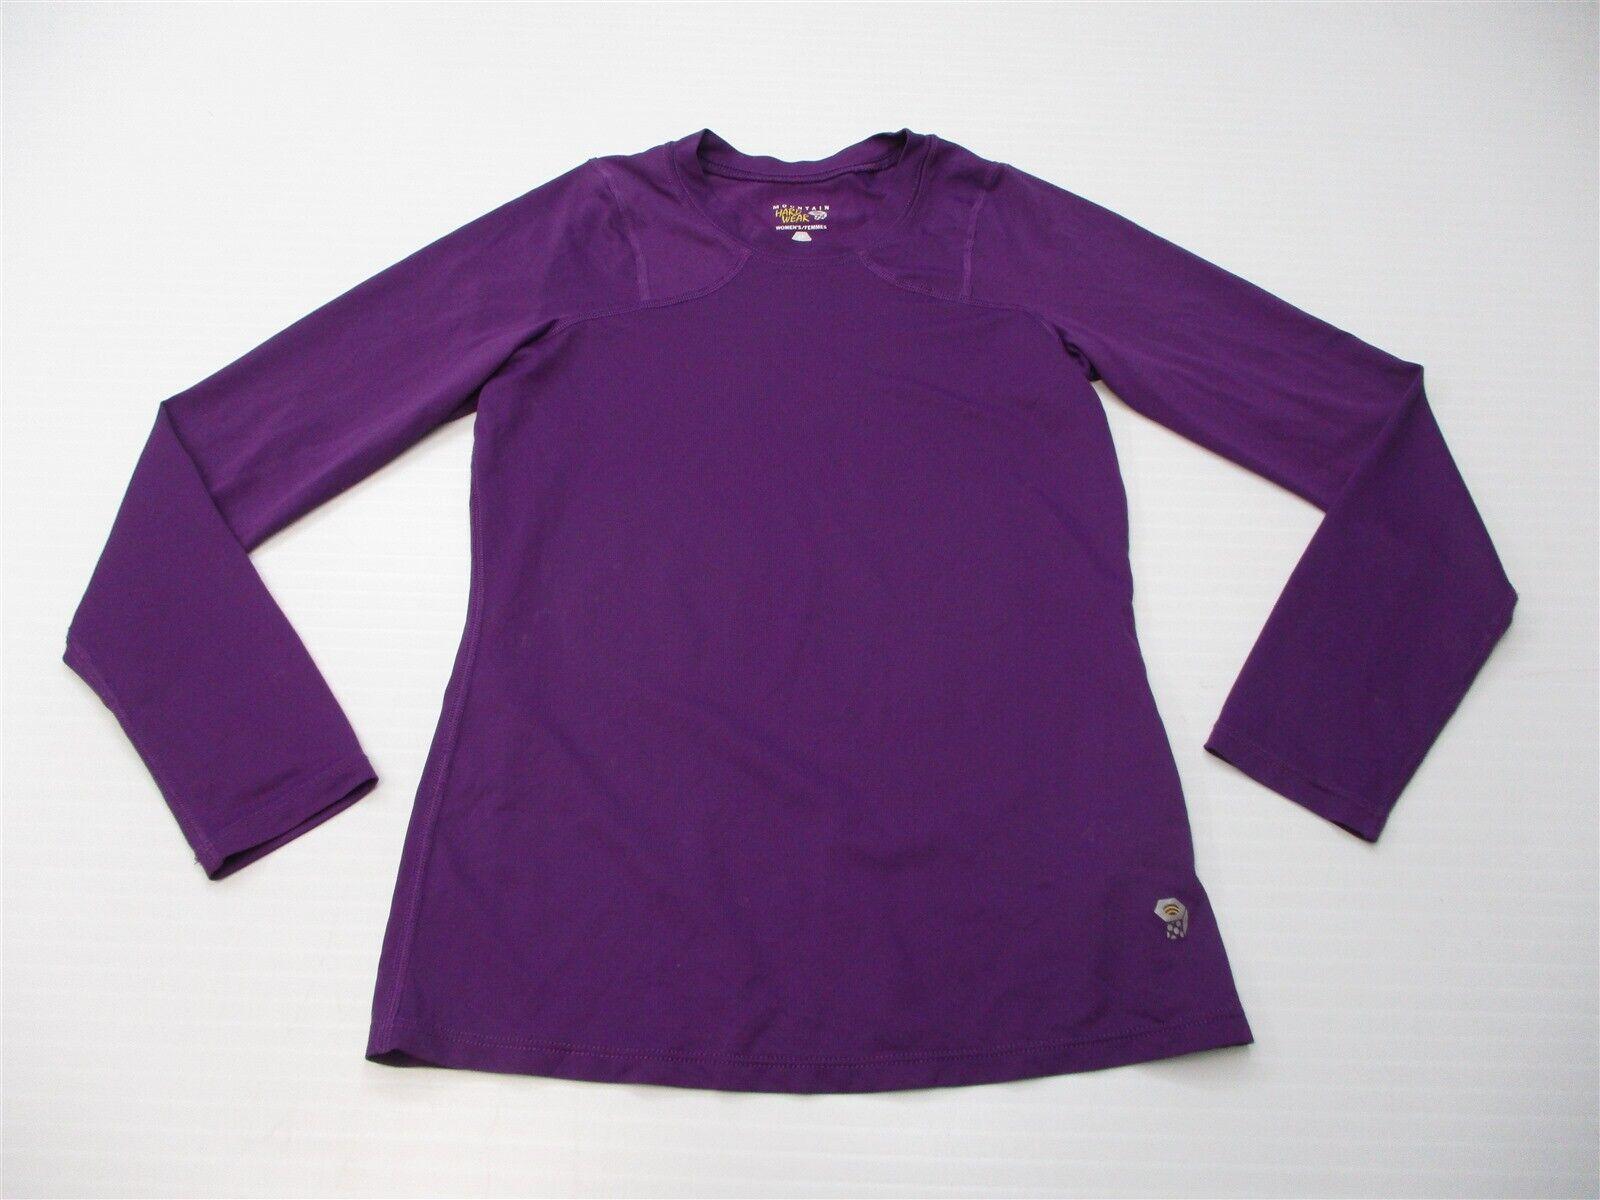 MOUNTAIN HARDWEAR Women Size XS Quick Dry Mesh Purple Fitted Long Sleeve T-Shirt